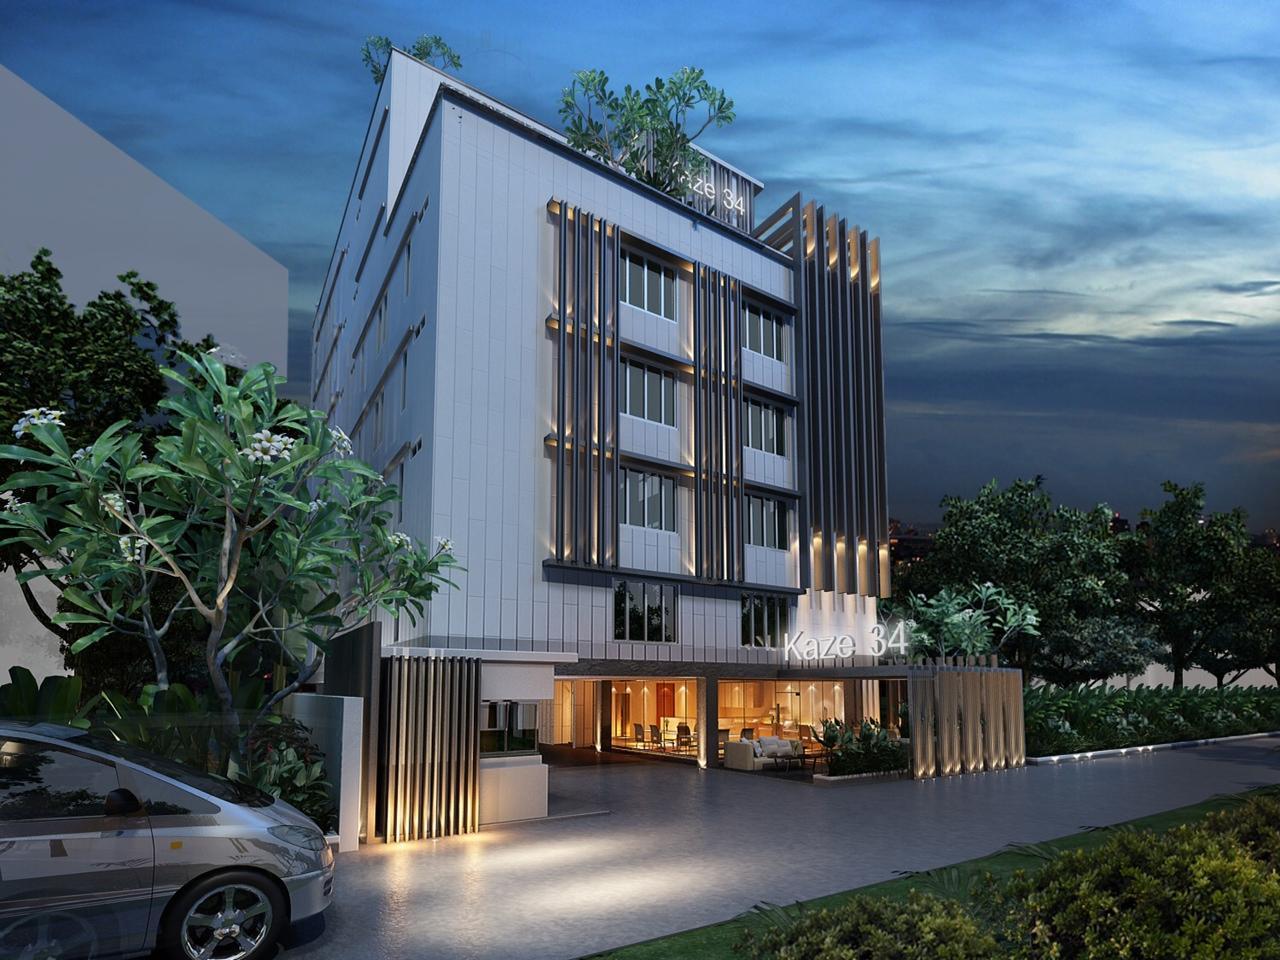 The Kaze 34 Hotel and Serviced Residence - Hotell och Boende i Thailand i Asien